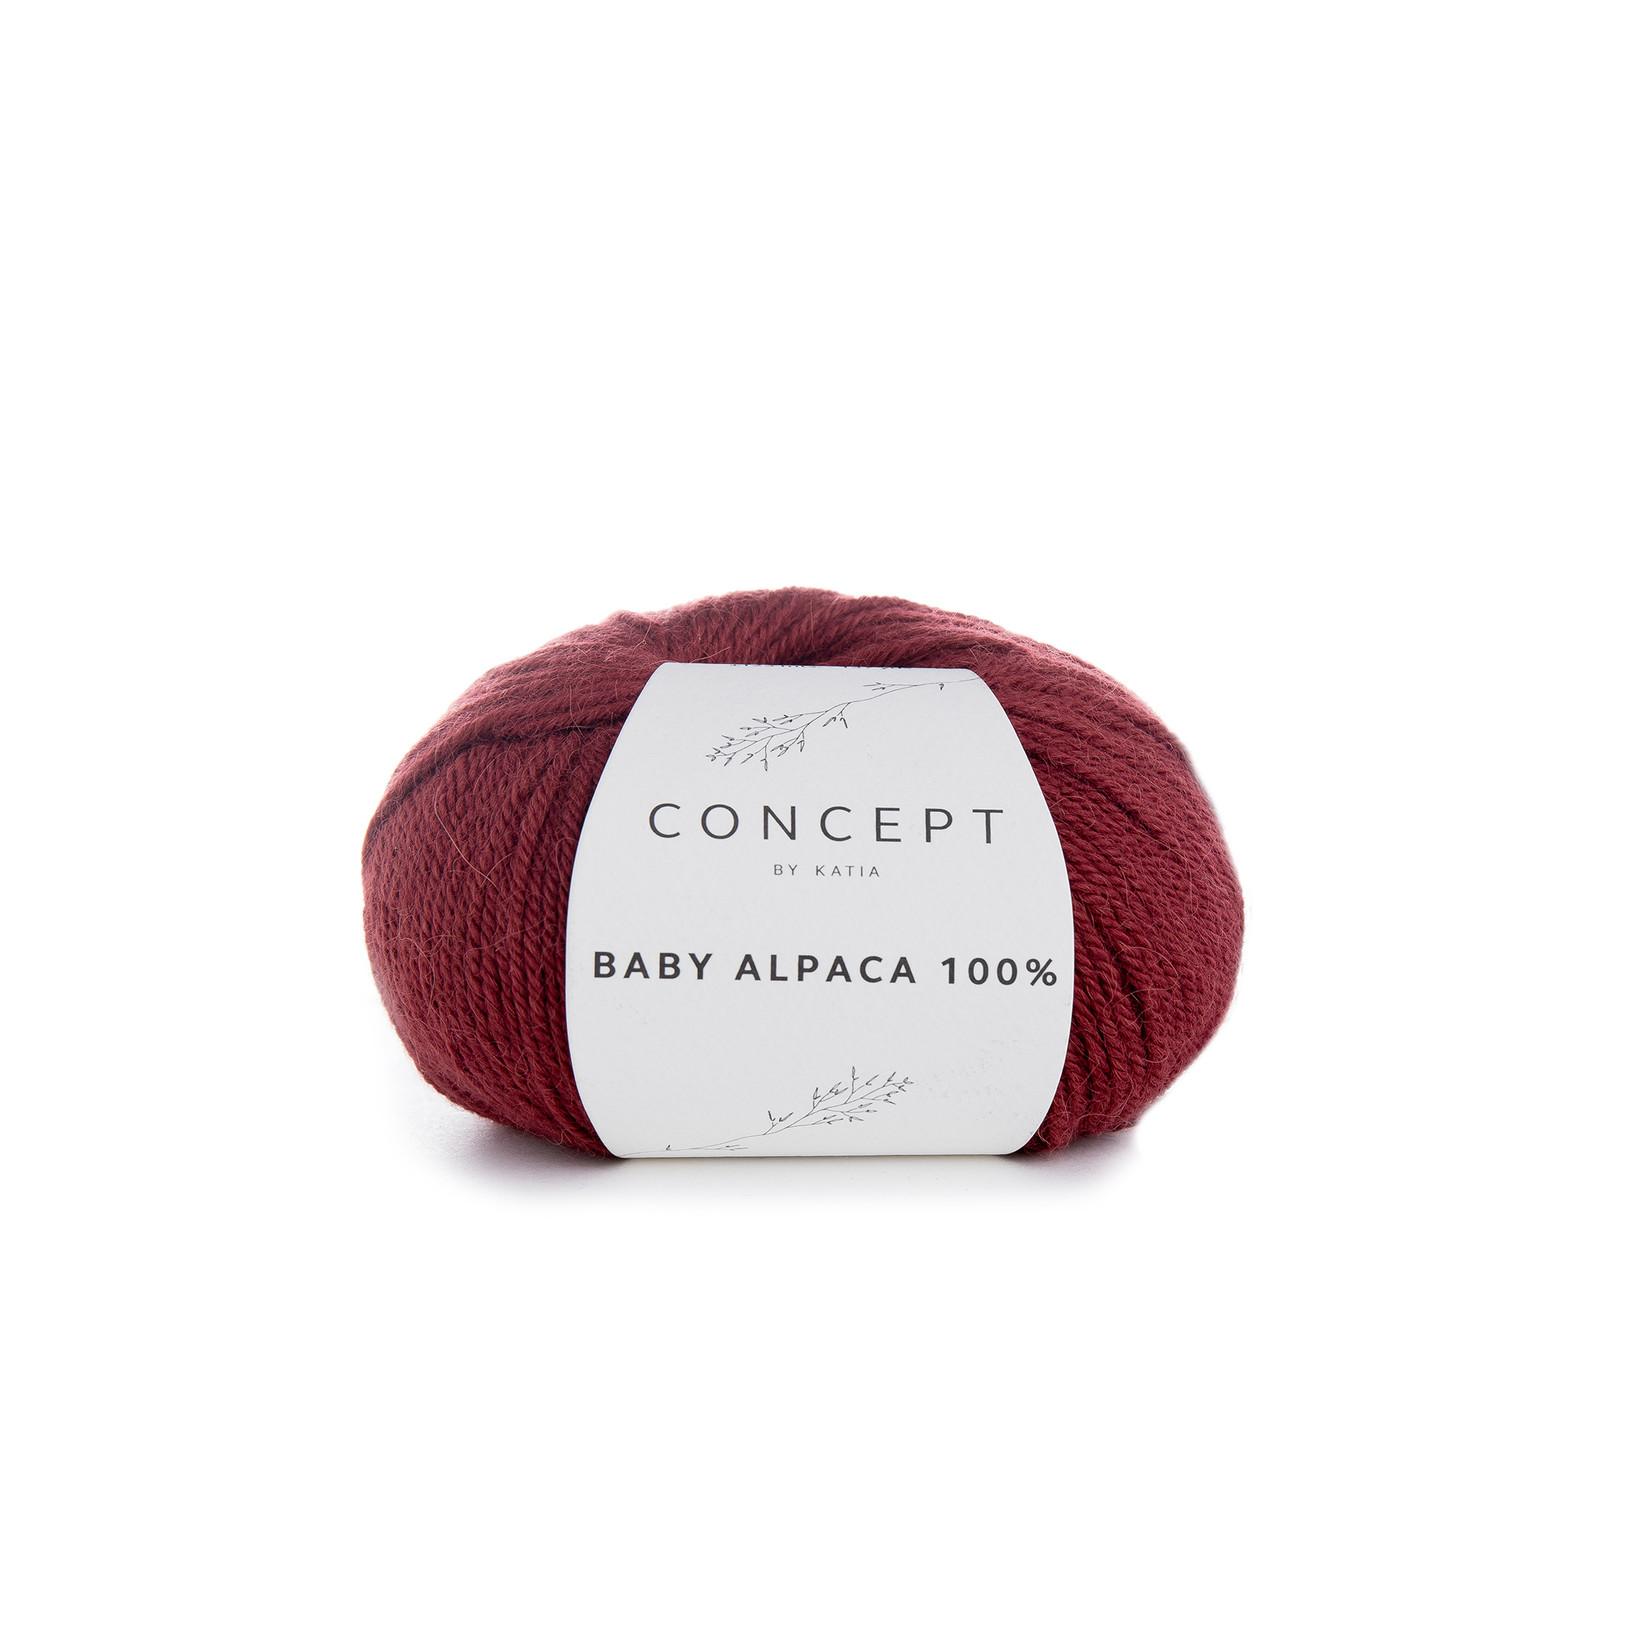 Katia Baby Alpaca 100% - kleur 512 - Bordeauxpaars - 50 gr. = 125 m. - 100% Baby Alpaca